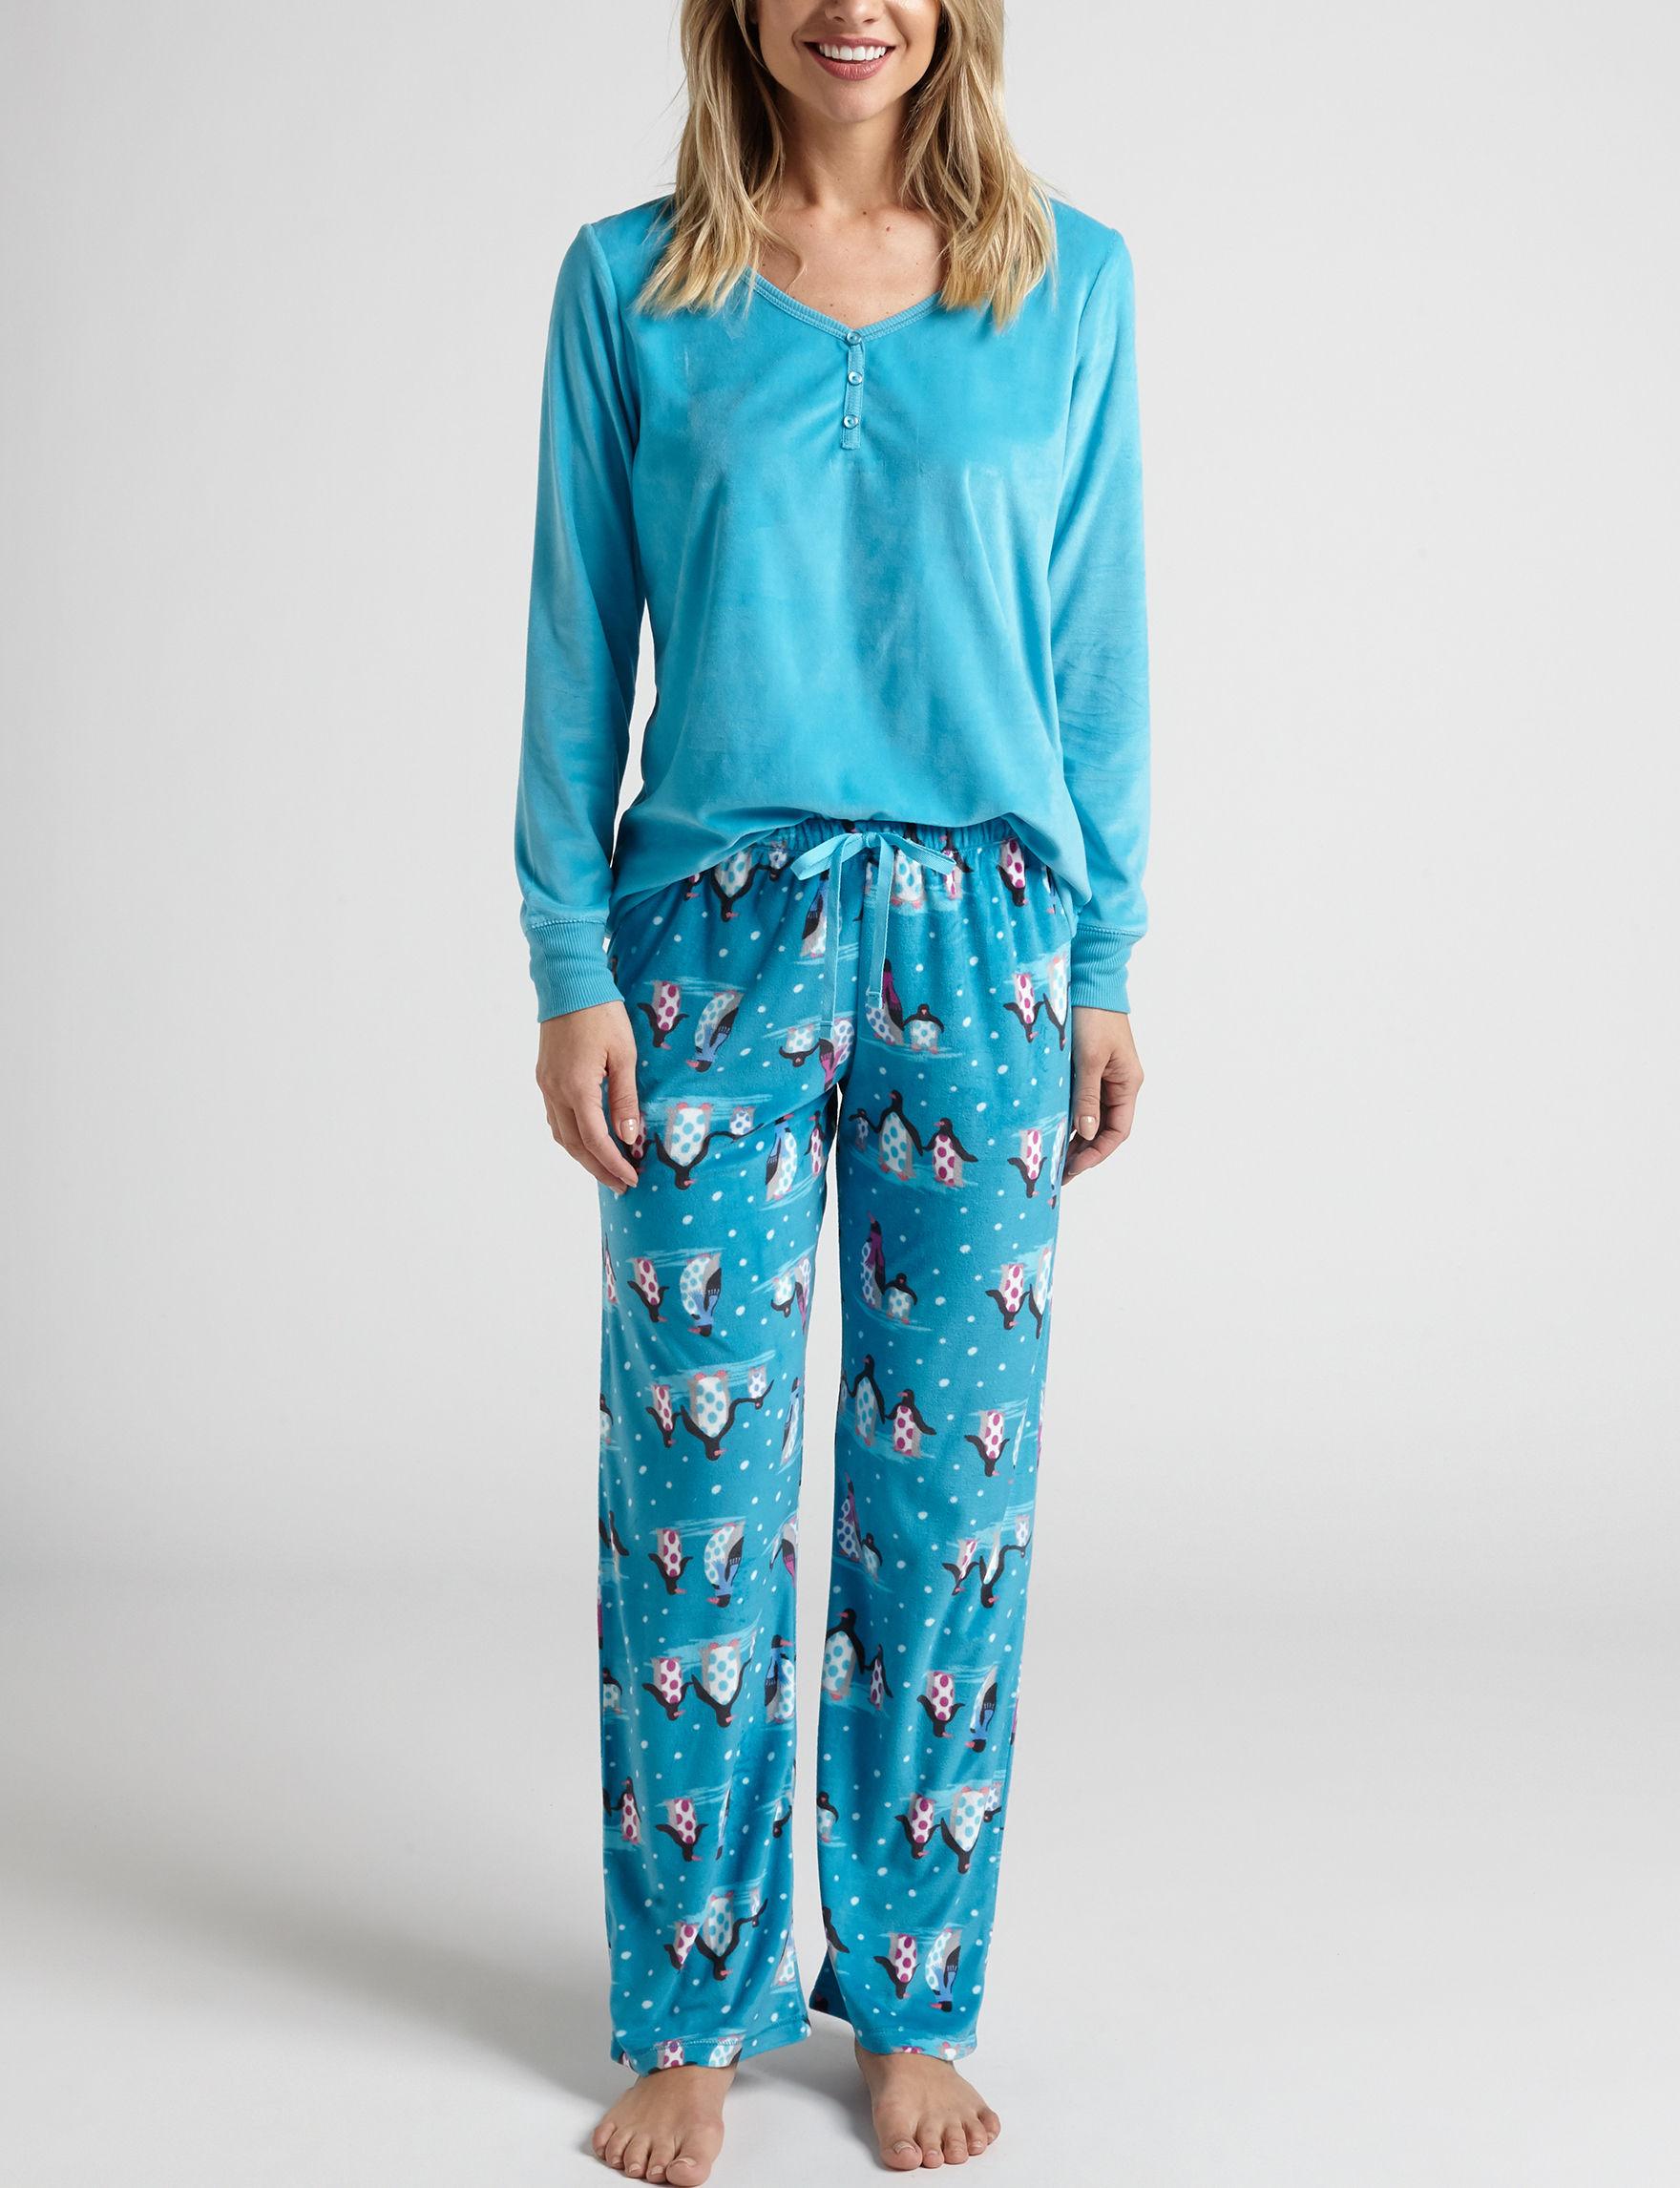 Hannah Turquoise Pajama Sets